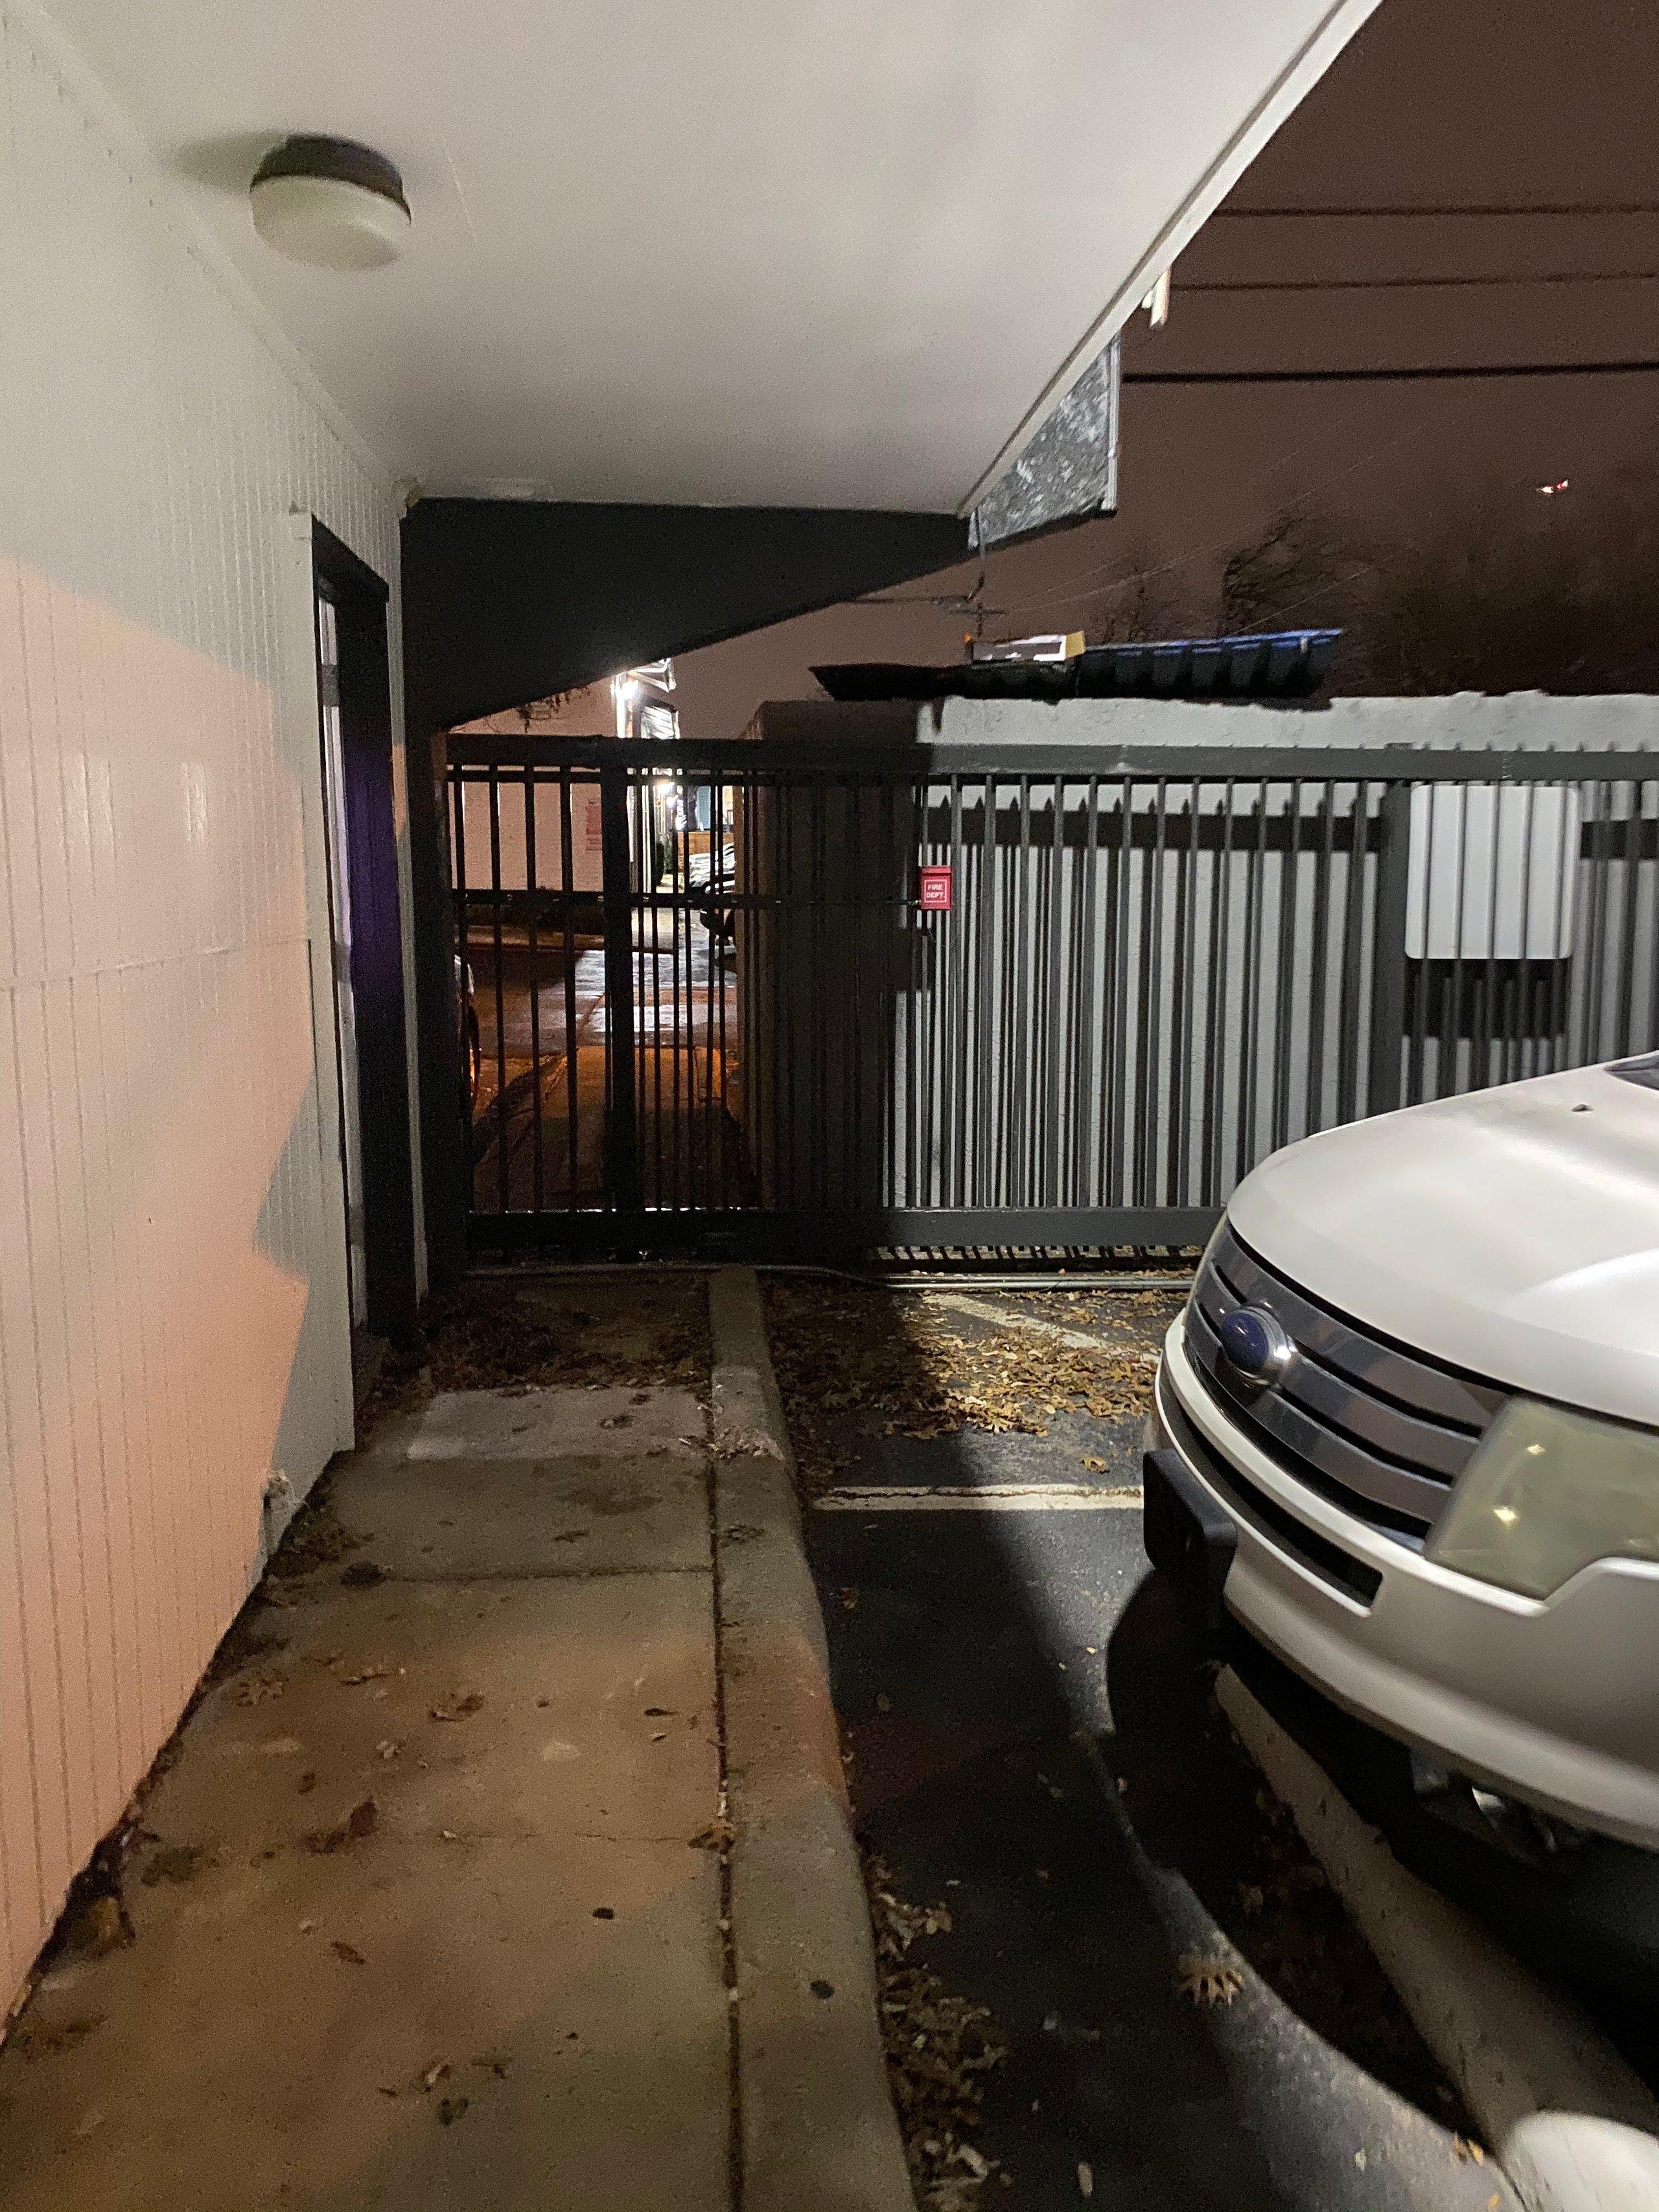 14x9 Driveway self storage unit